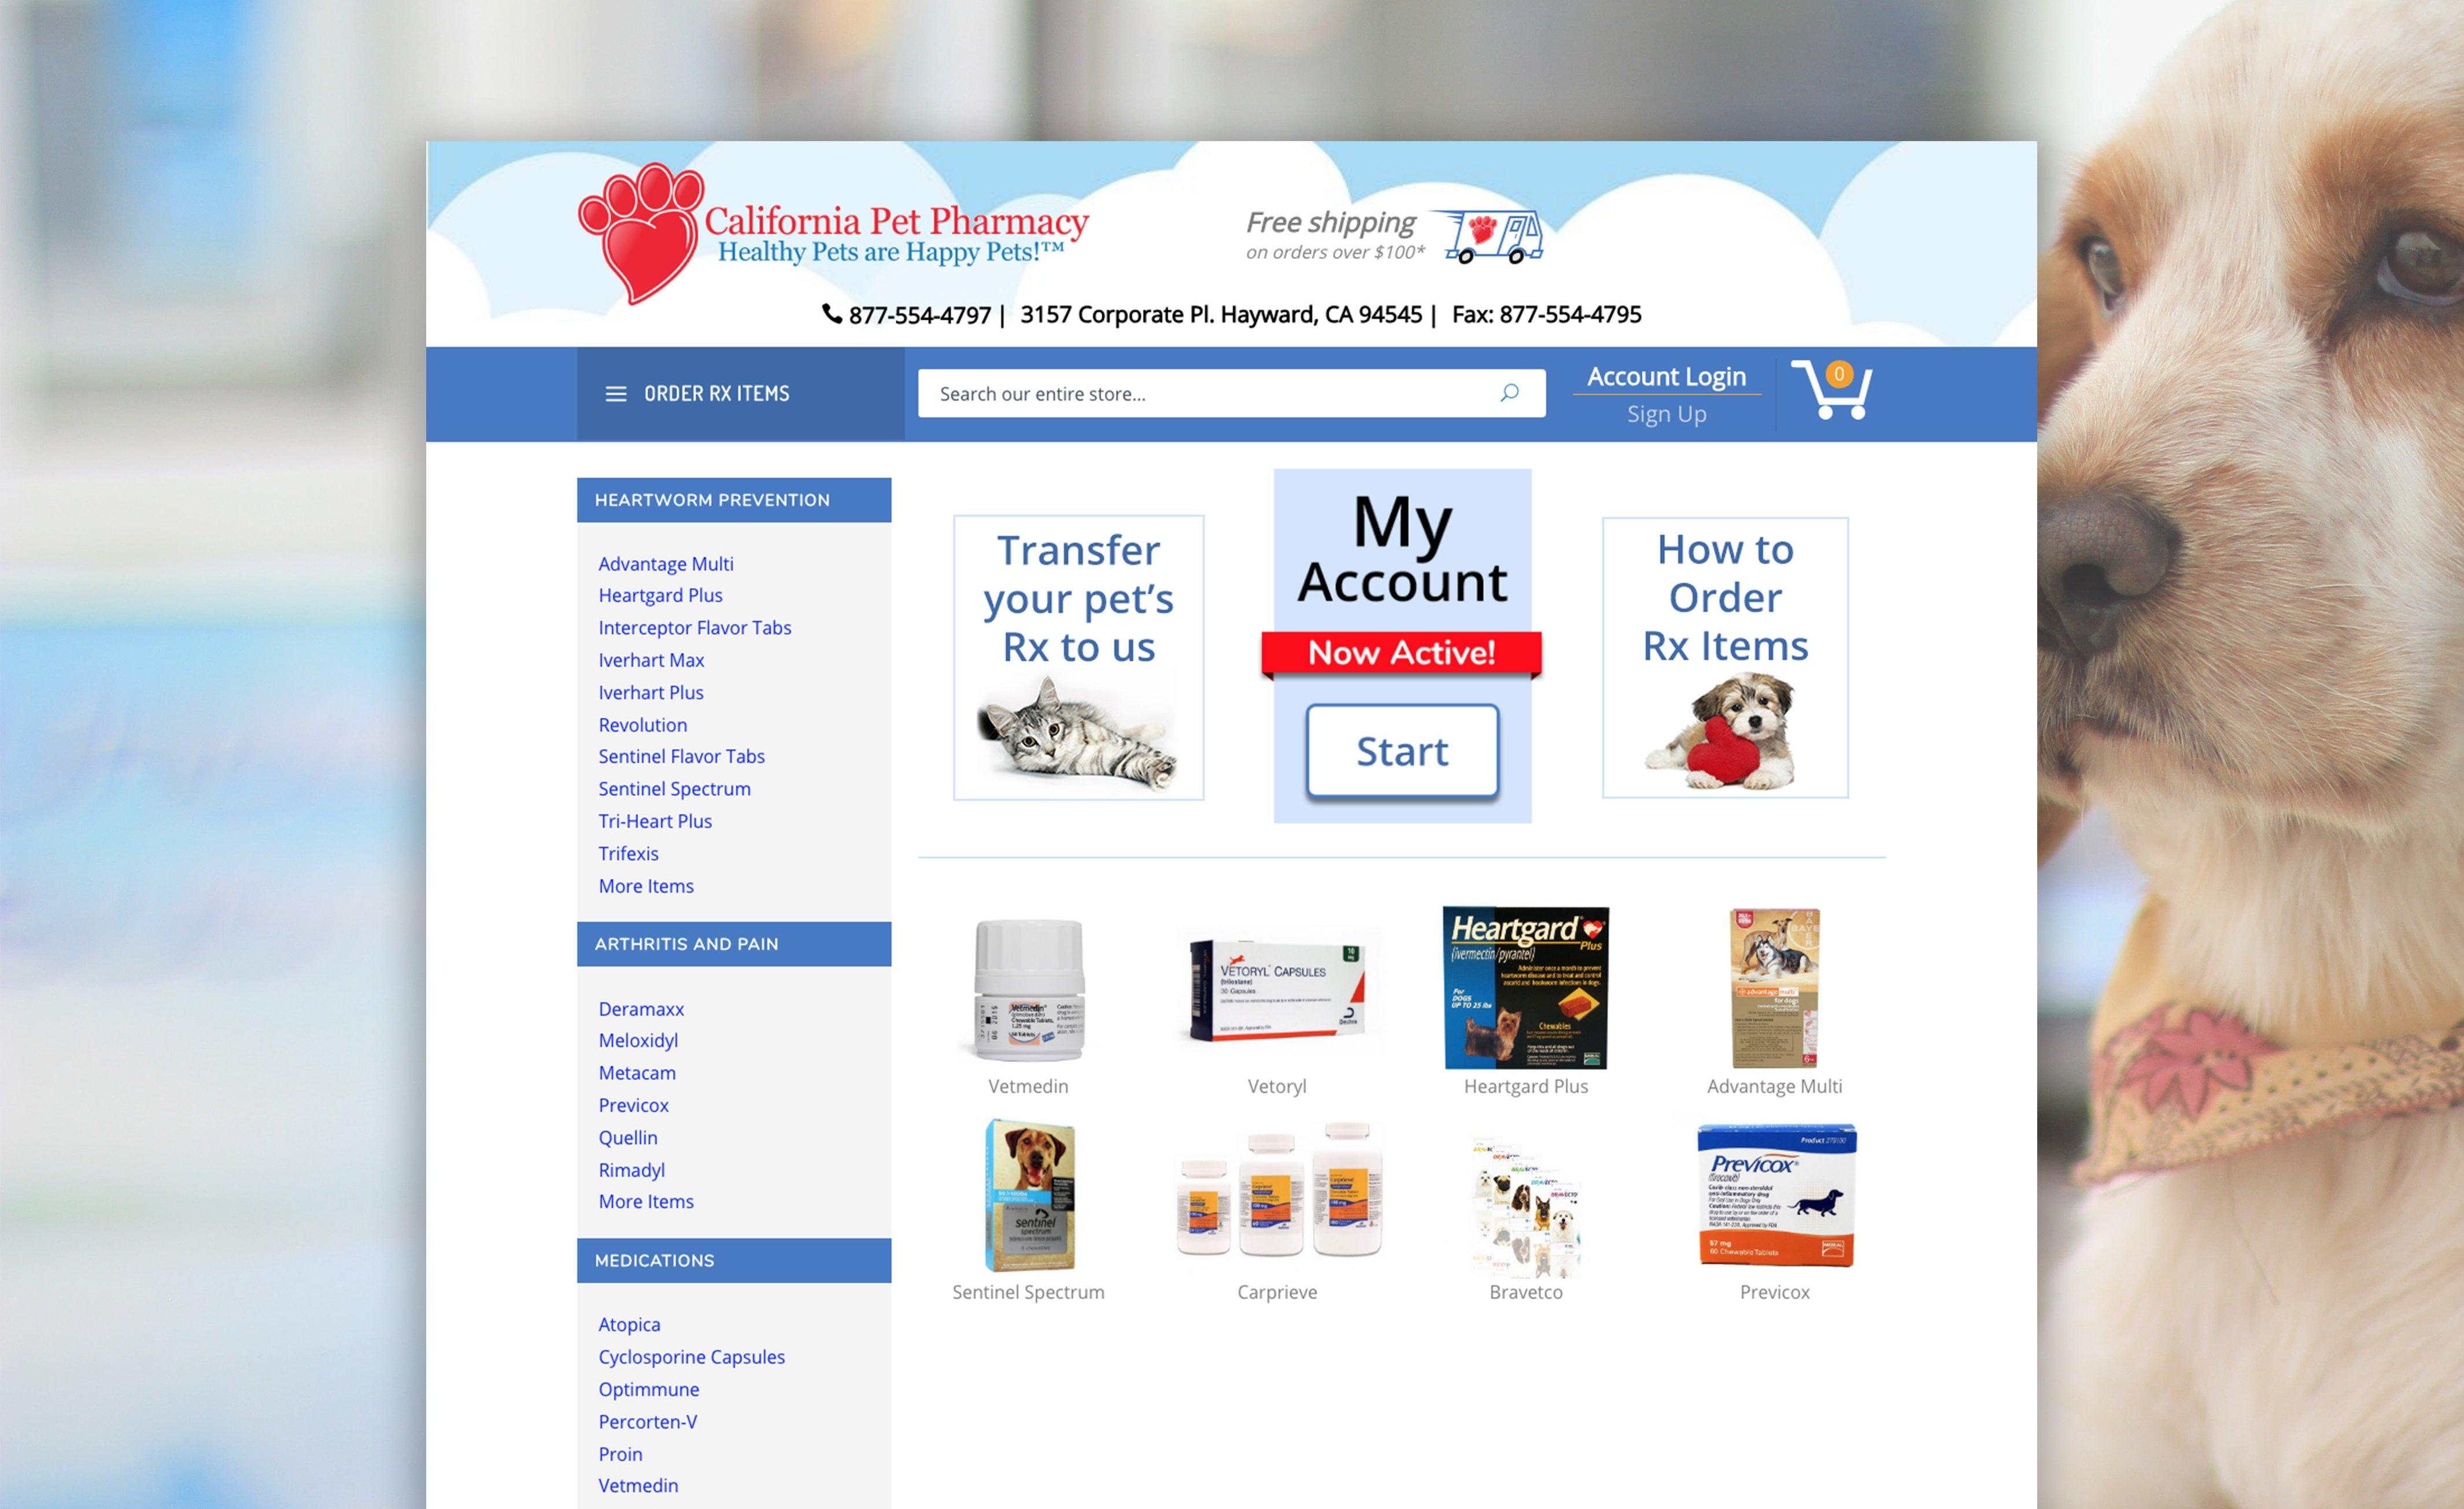 California Pet Pharmacy